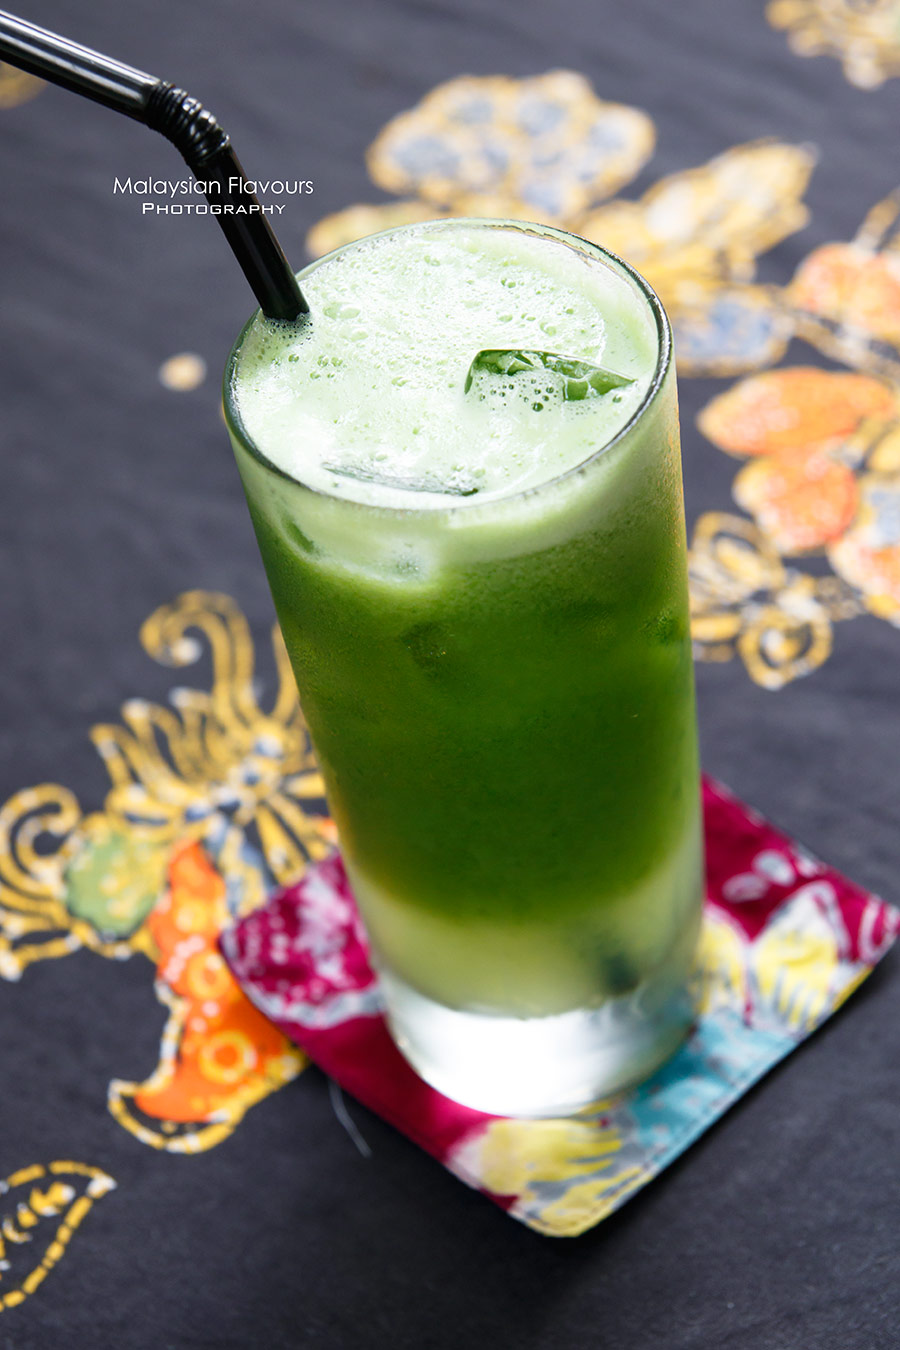 green-tomato-cafe-yayasan-seni-ampang-kl